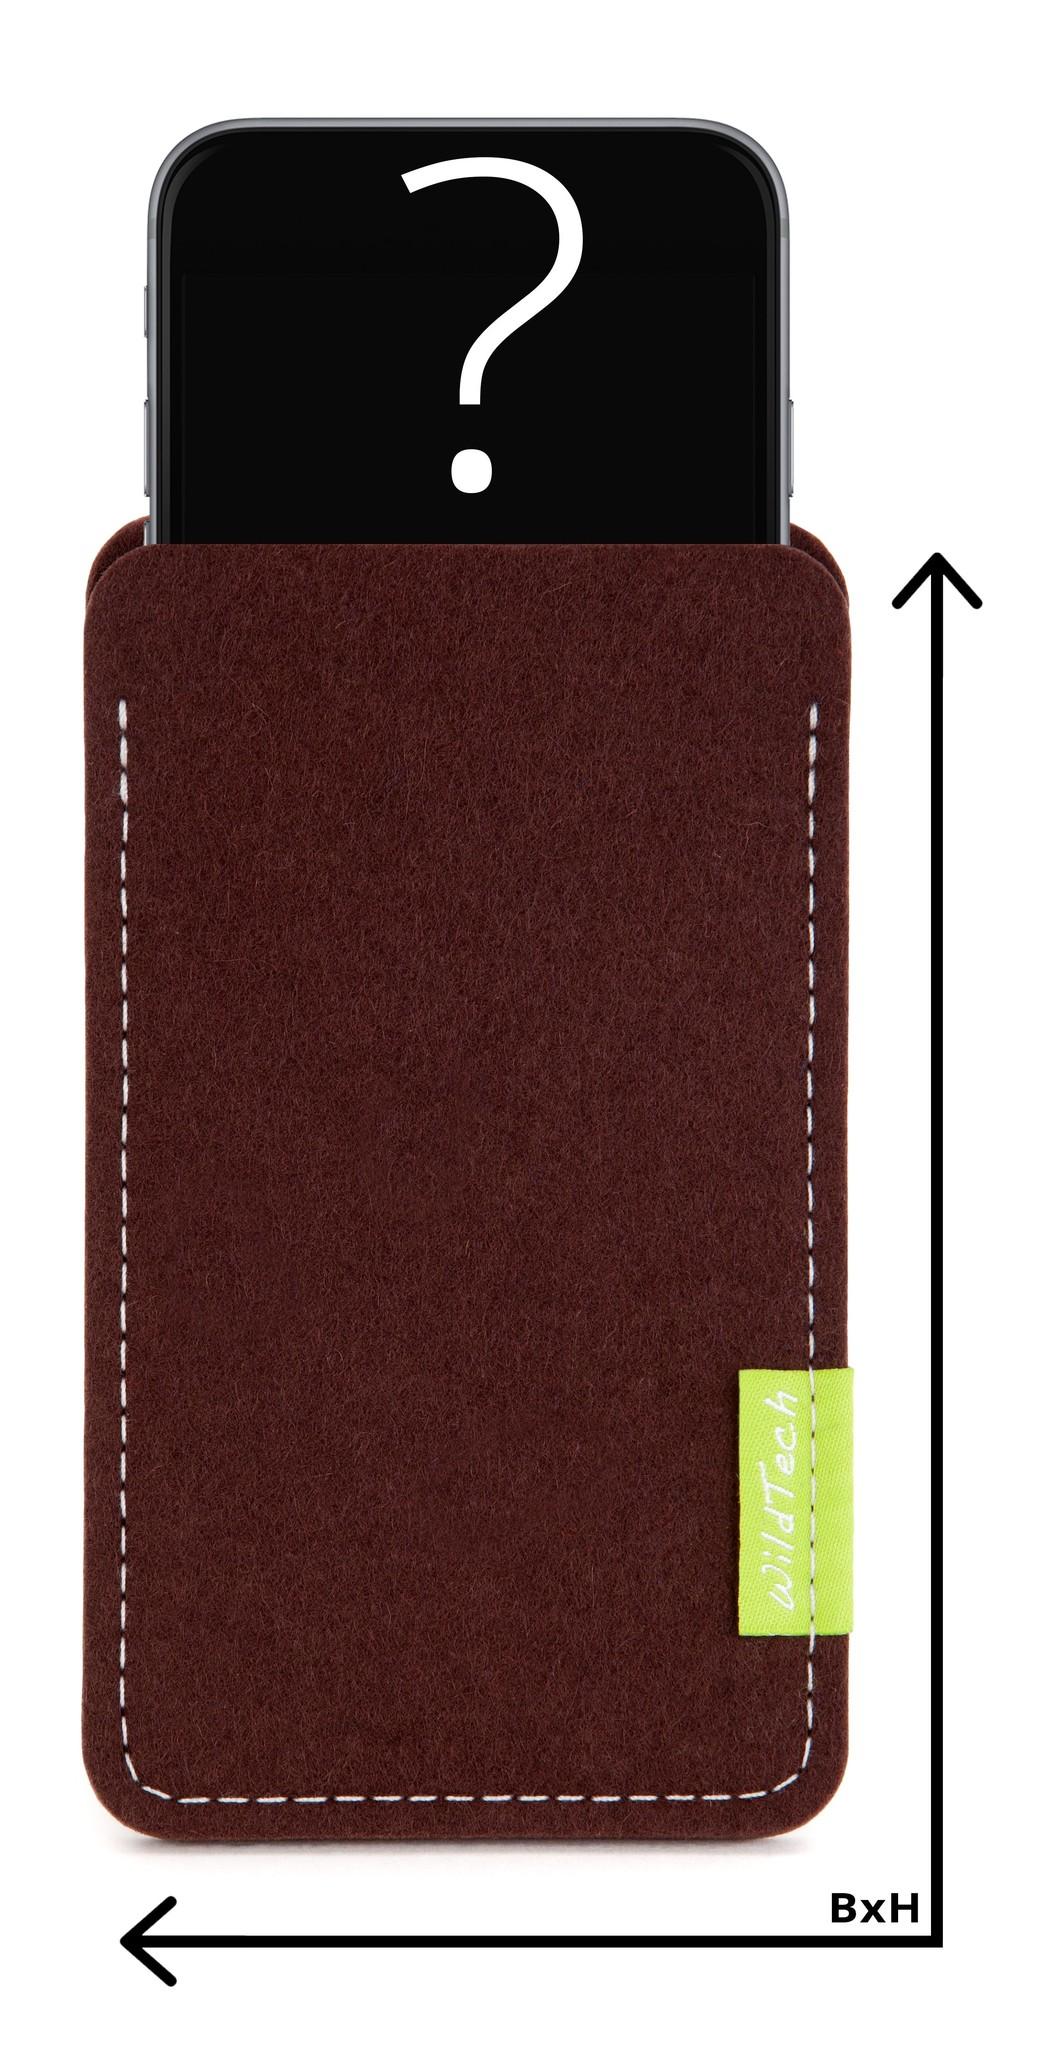 Individuelles Smartphone Sleeve Dunkelbraun-1